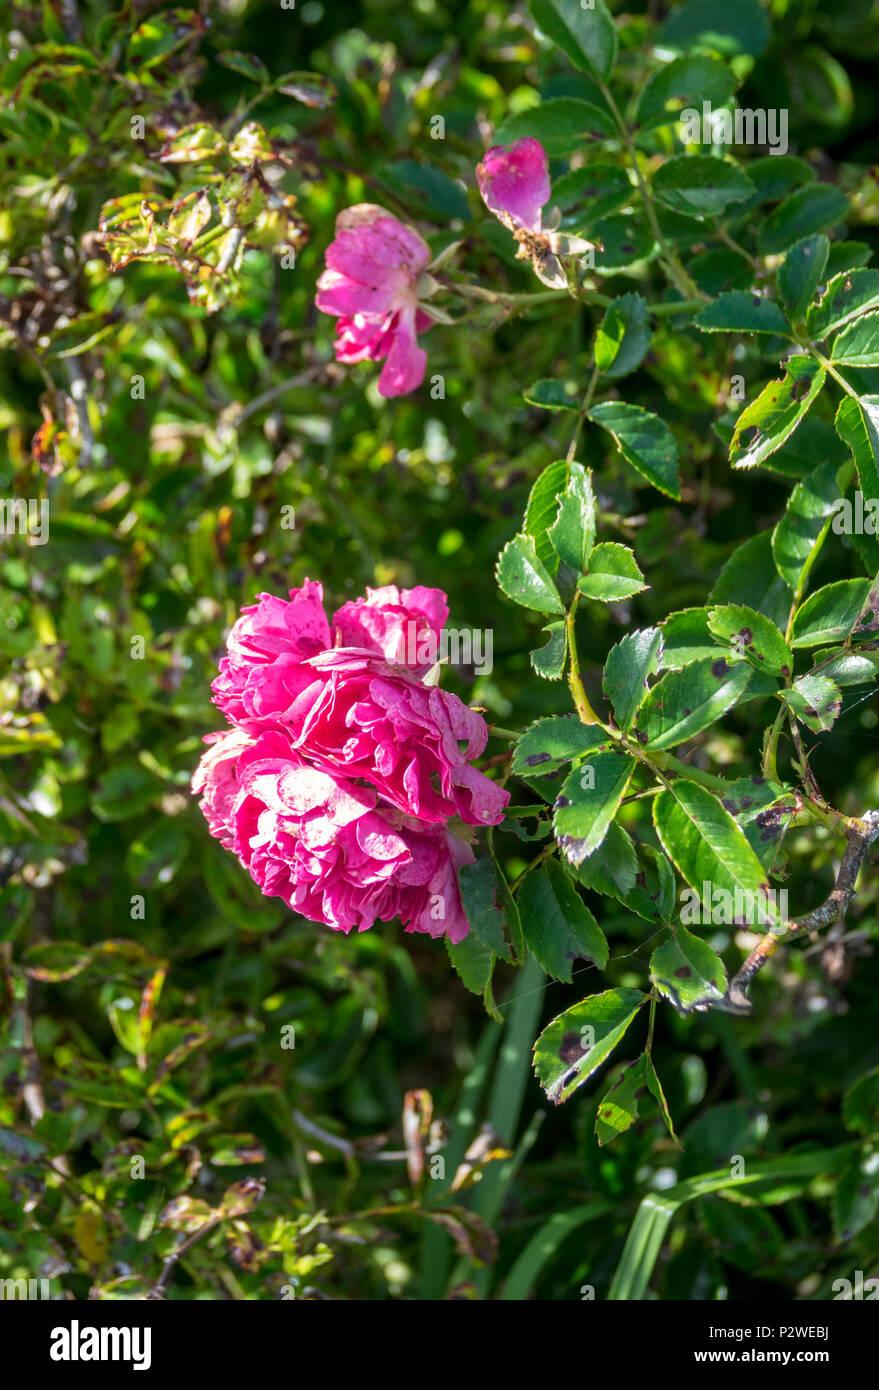 Rose with black spot disease growing at Tristan da Cunha, British Overseas Territories, South Atlantic Ocean - Stock Image